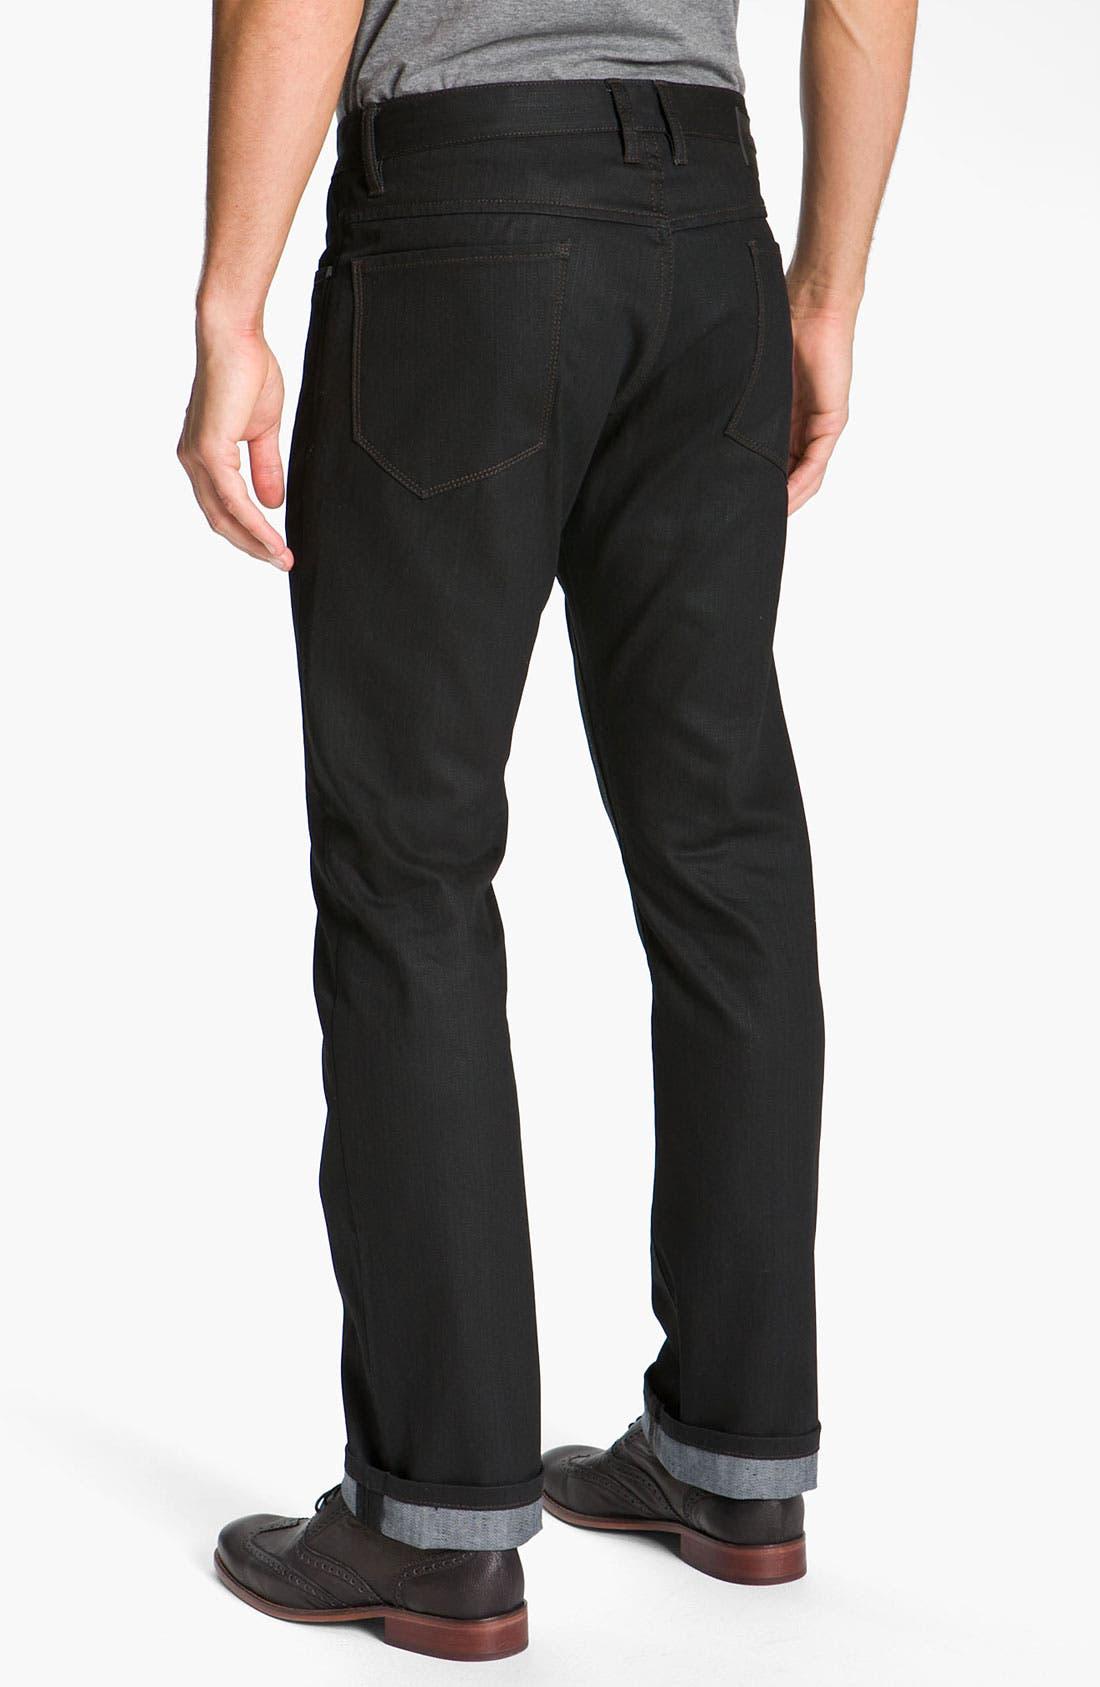 Main Image - Comune 'Rudy' Coated Slim Straight Leg Jeans (Black Indigo)